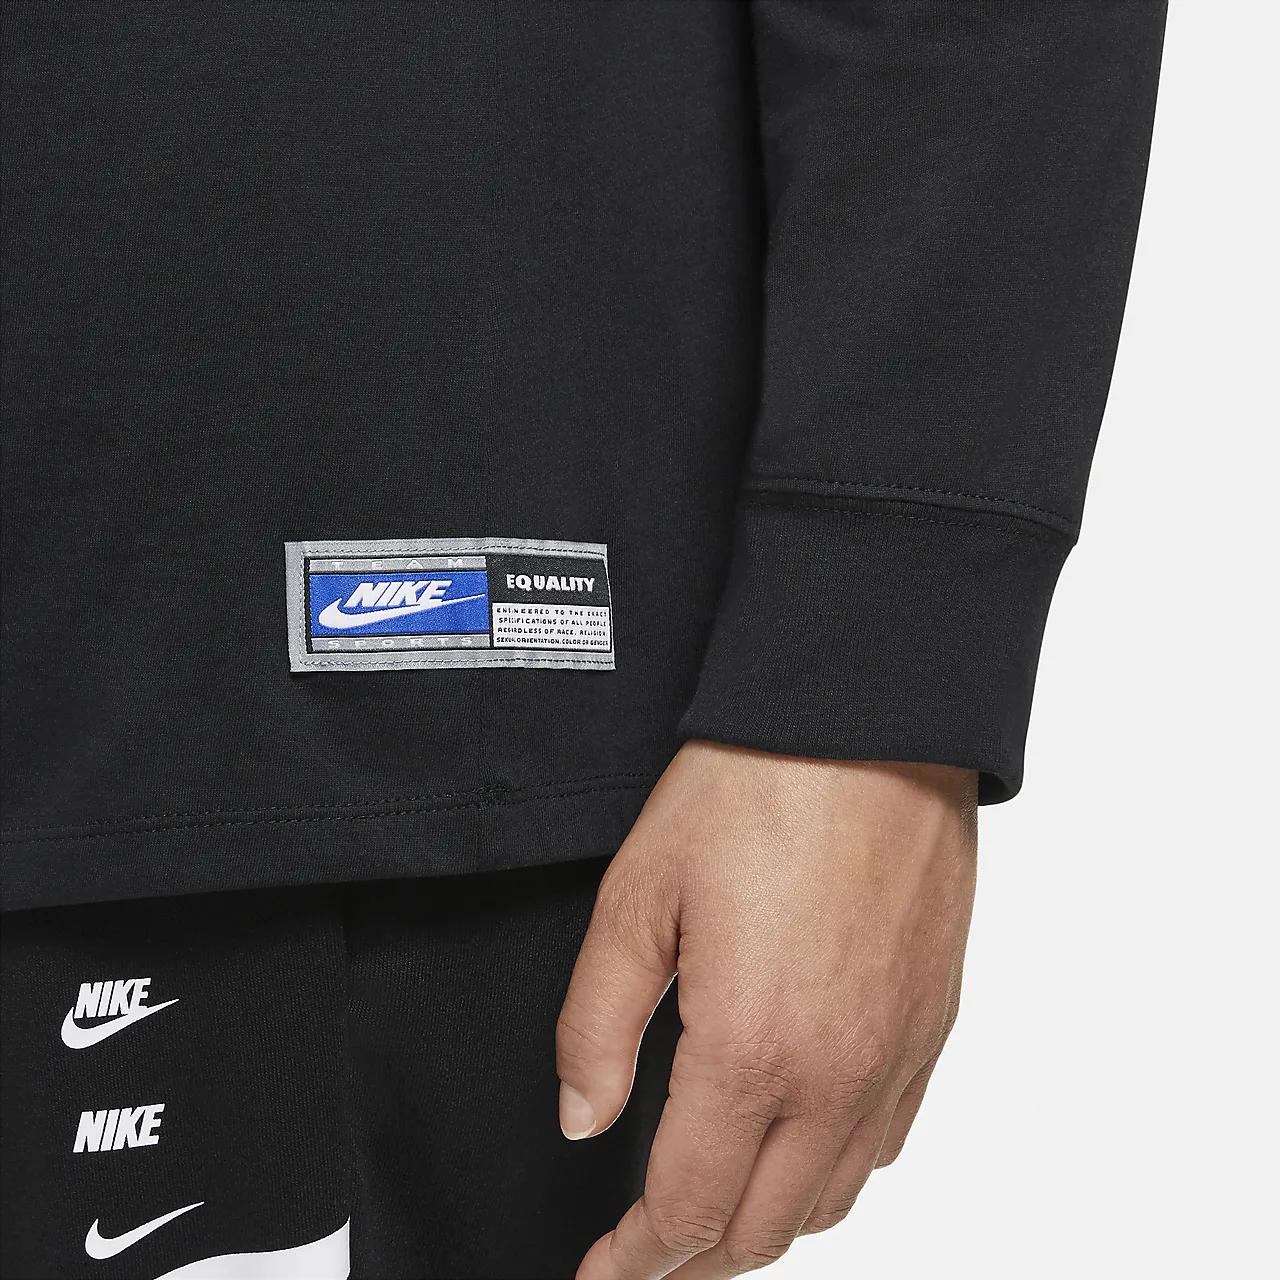 Nike Sportswear Women's Long-Sleeve T-Shirt (Plus Size) DH1103-010